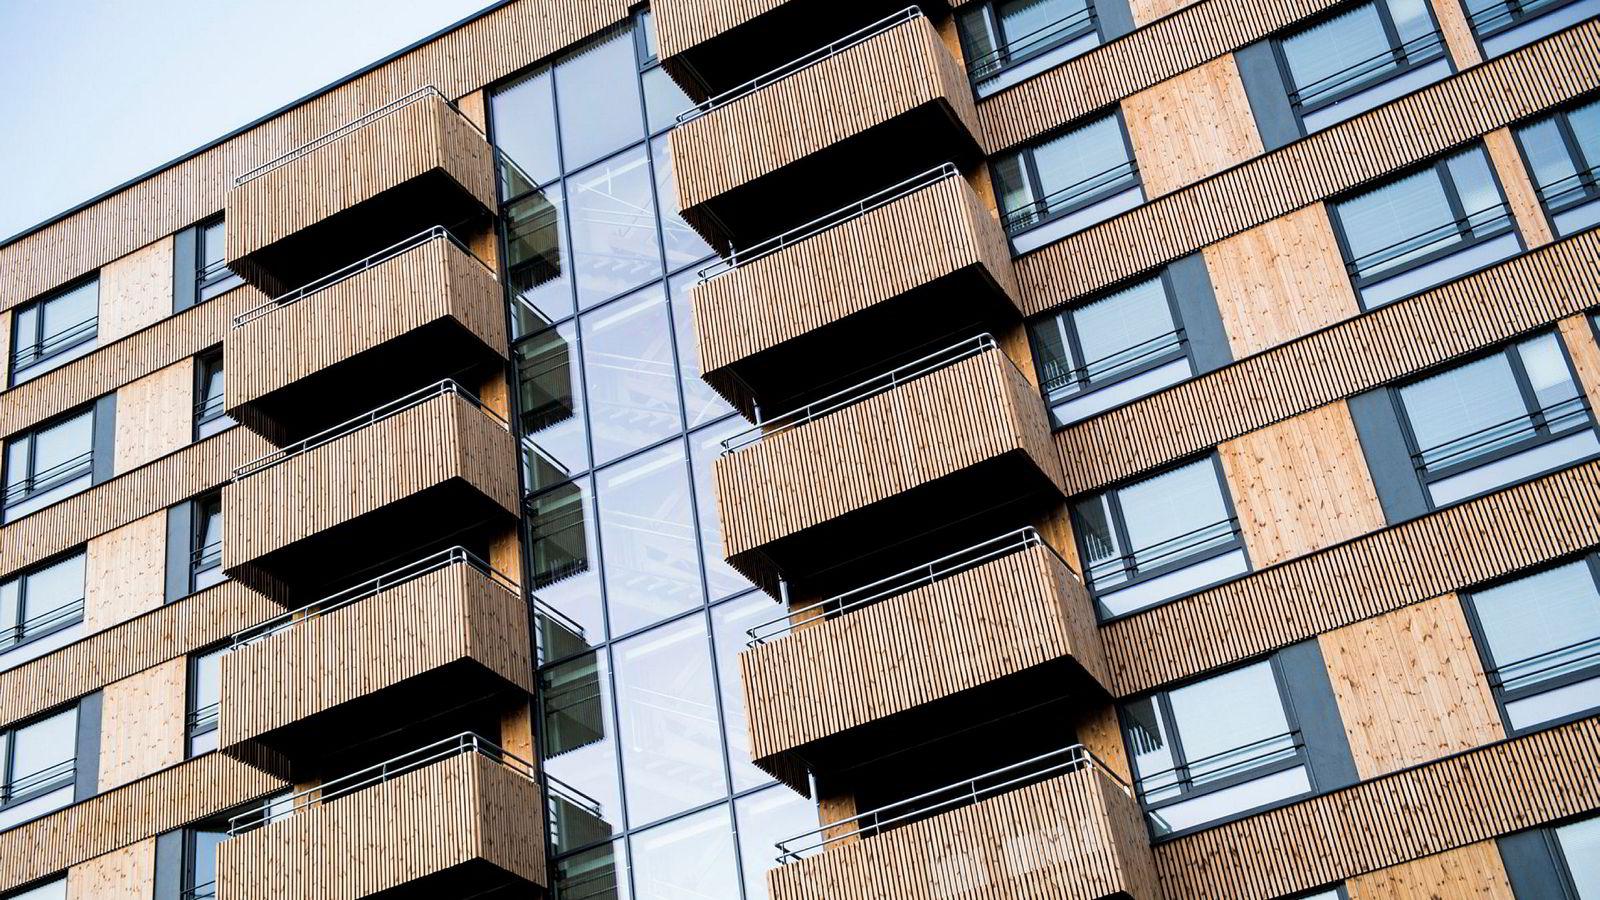 Regjeringen har satset på bygging av nye studentboliger. Her er nybygde studentboliger på Kringsjå i Oslo.